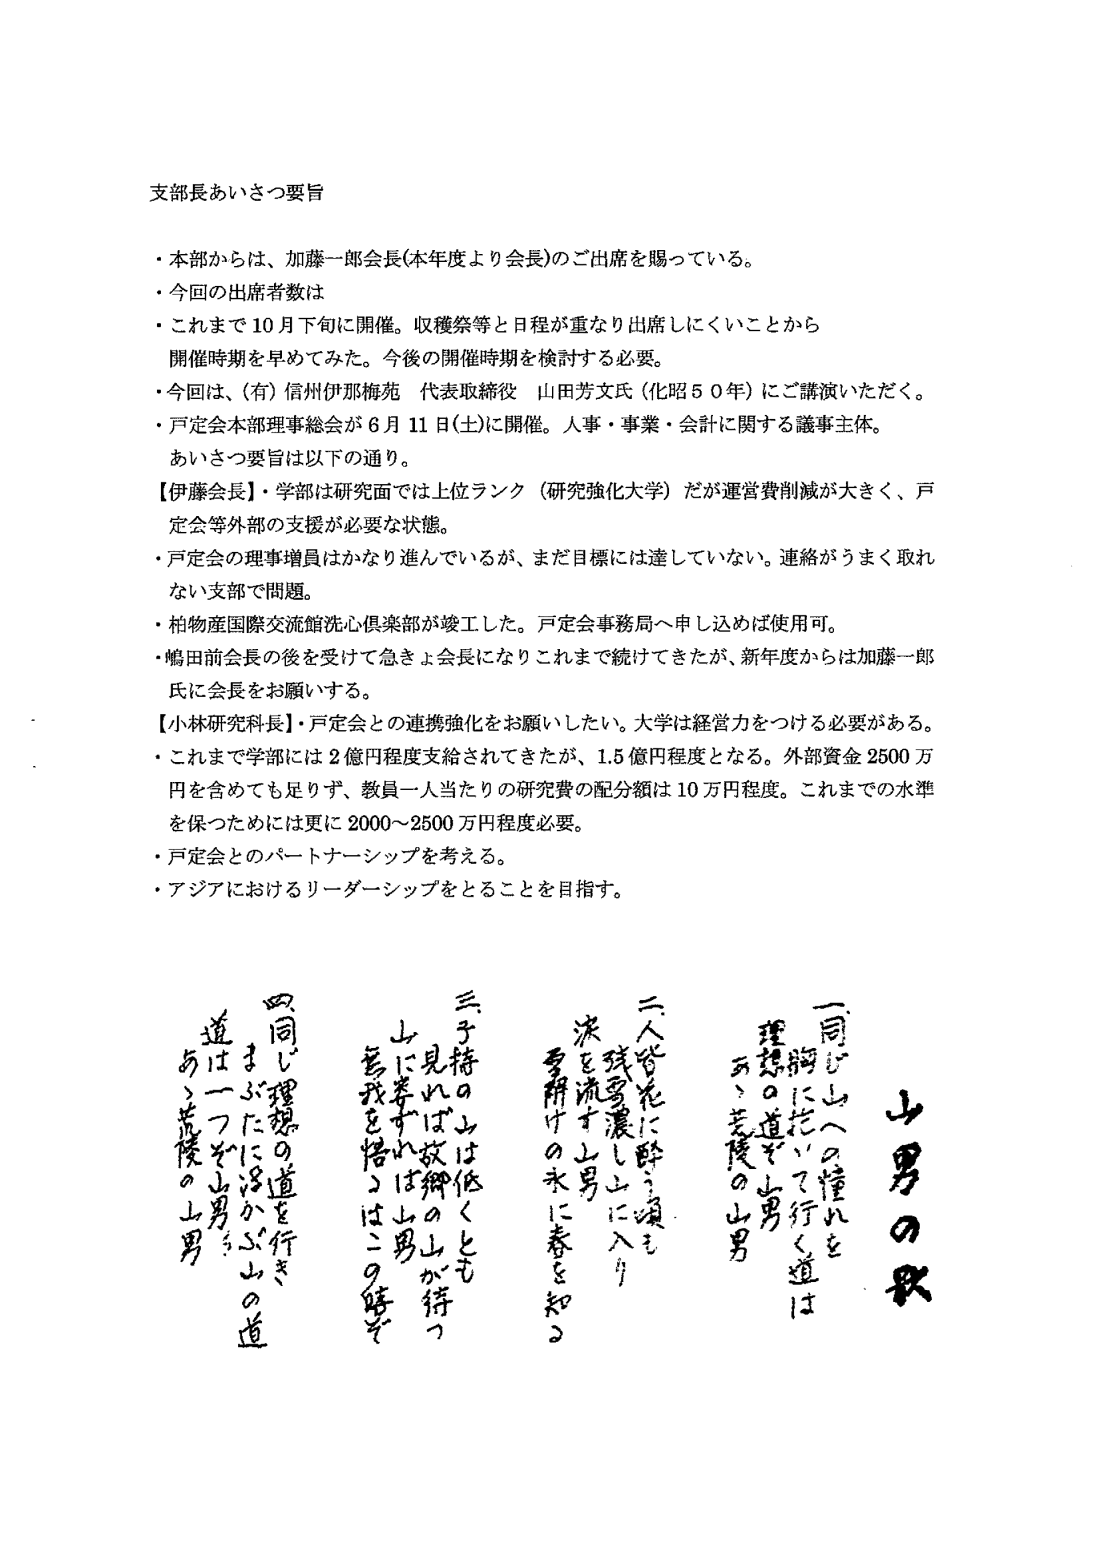 28長野支部総会資料_ページ_7.png